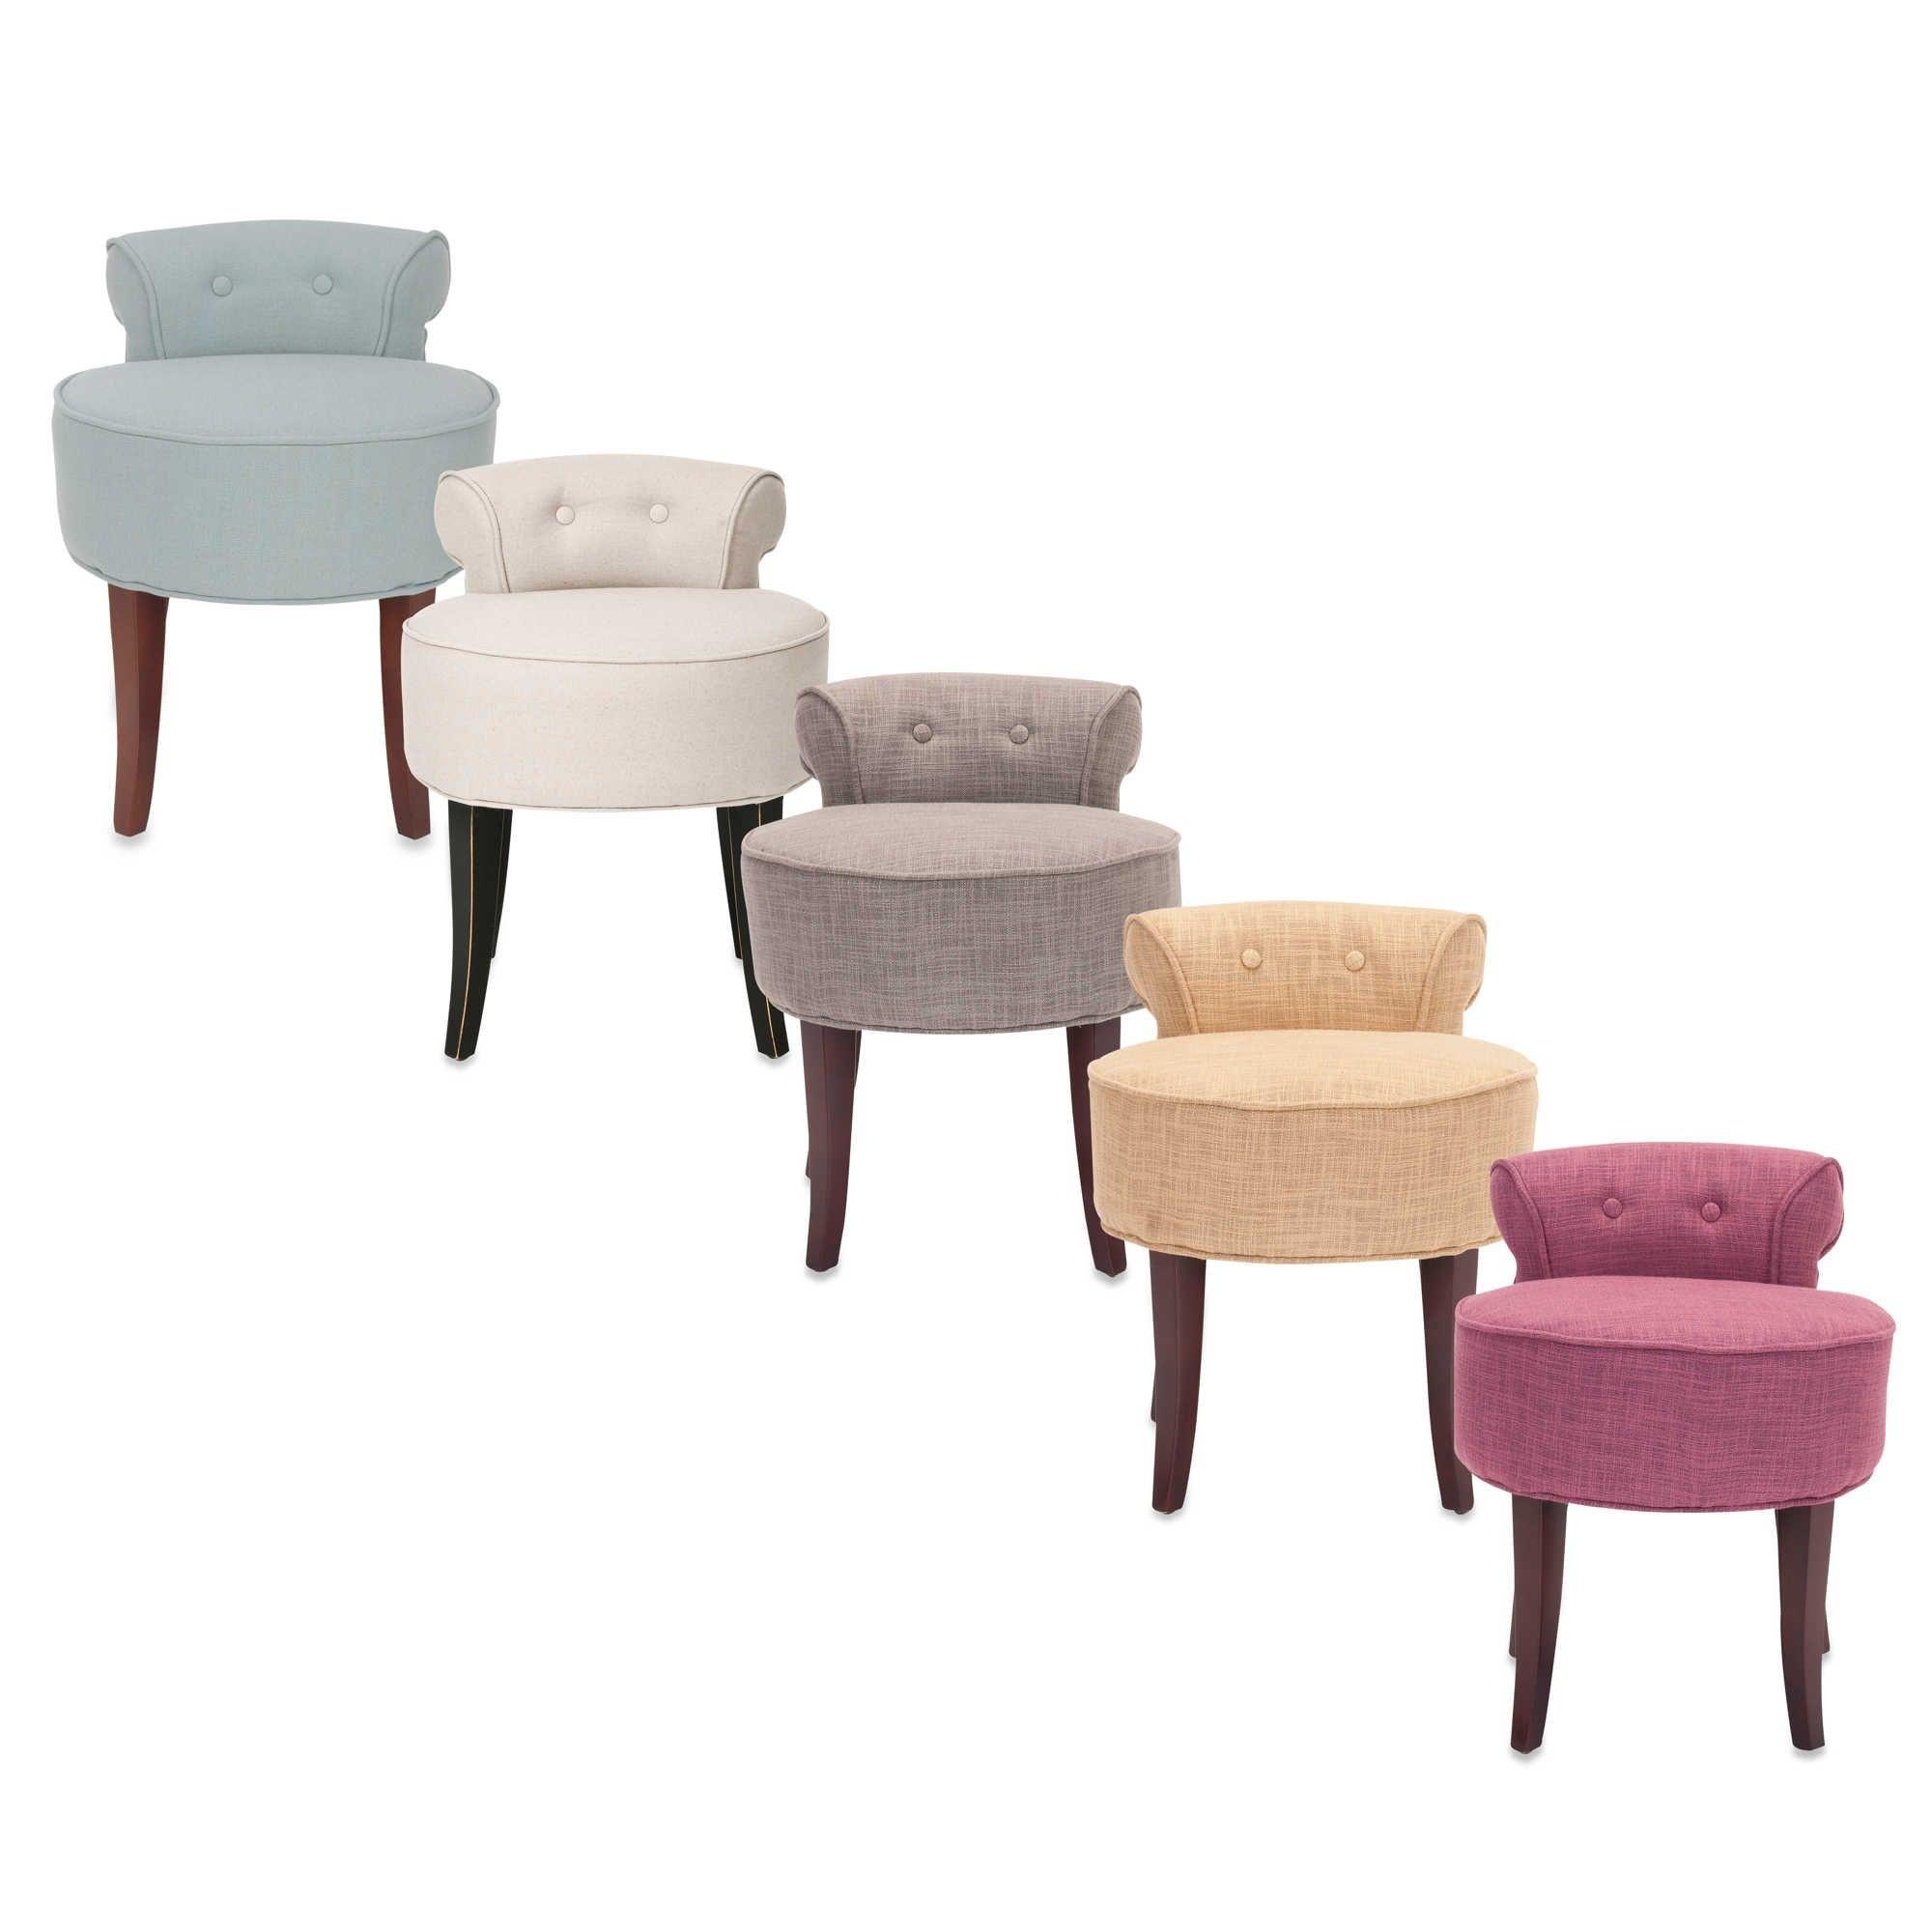 Bathroom Vanity Chairs With Wheels